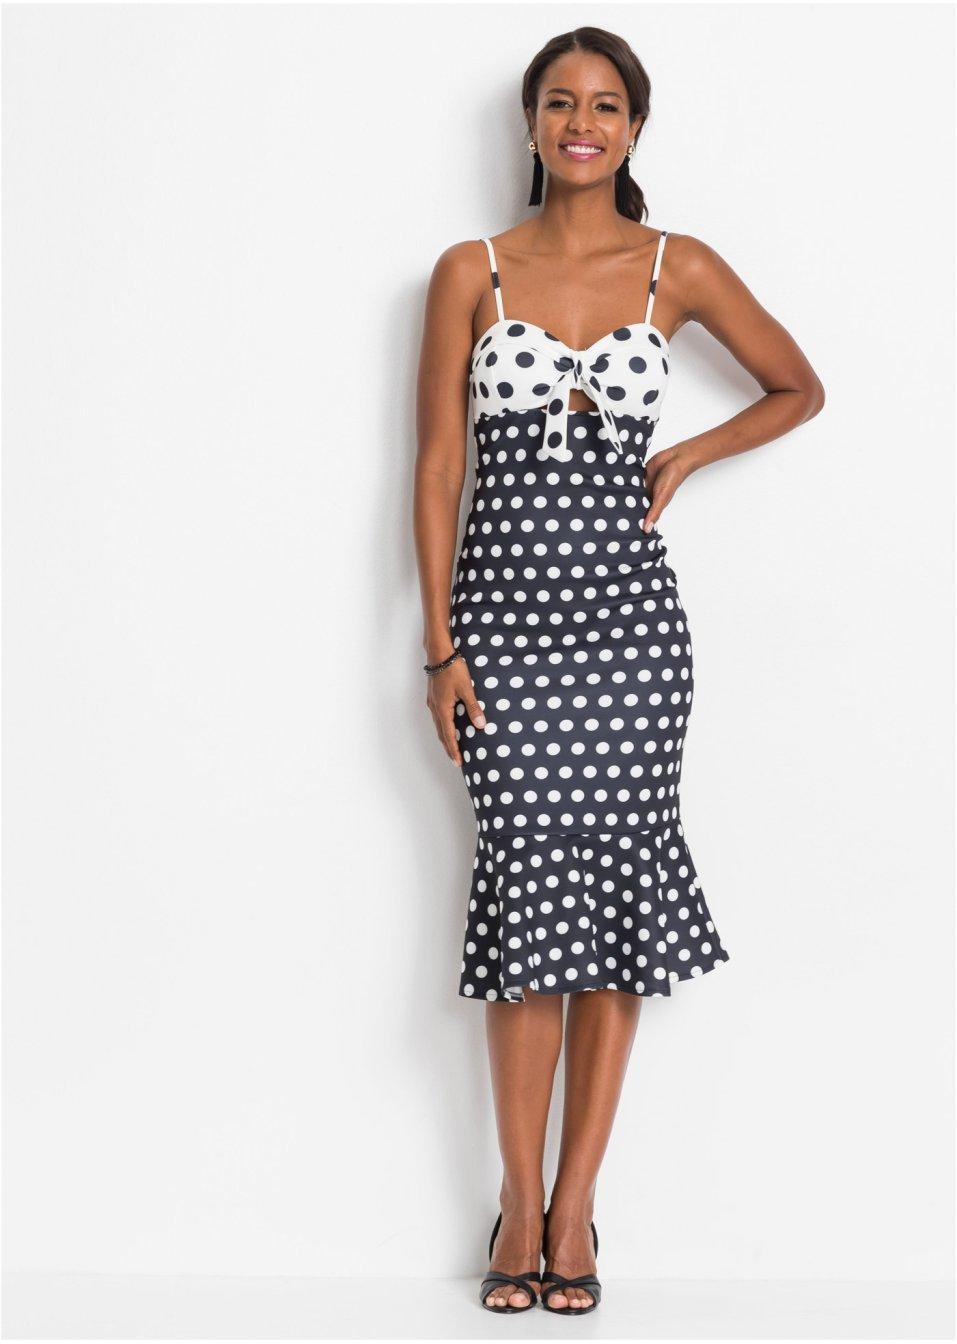 8fb3707604e099 Jurk zwart wit gestippeld - BODYFLIRT boutique koop online - bonprix-fl.be